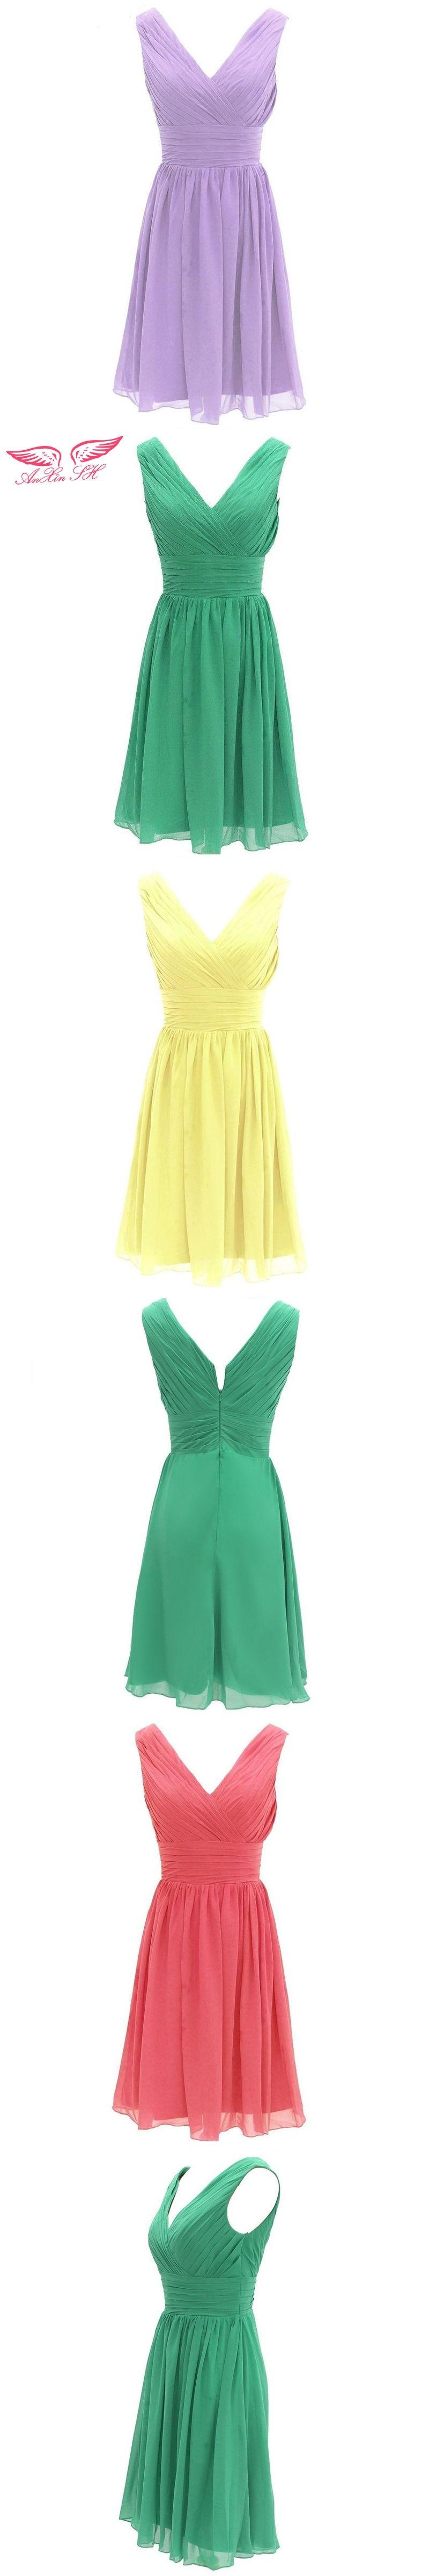 Anxin sh green chiffon a line bridesmaid dress pink short